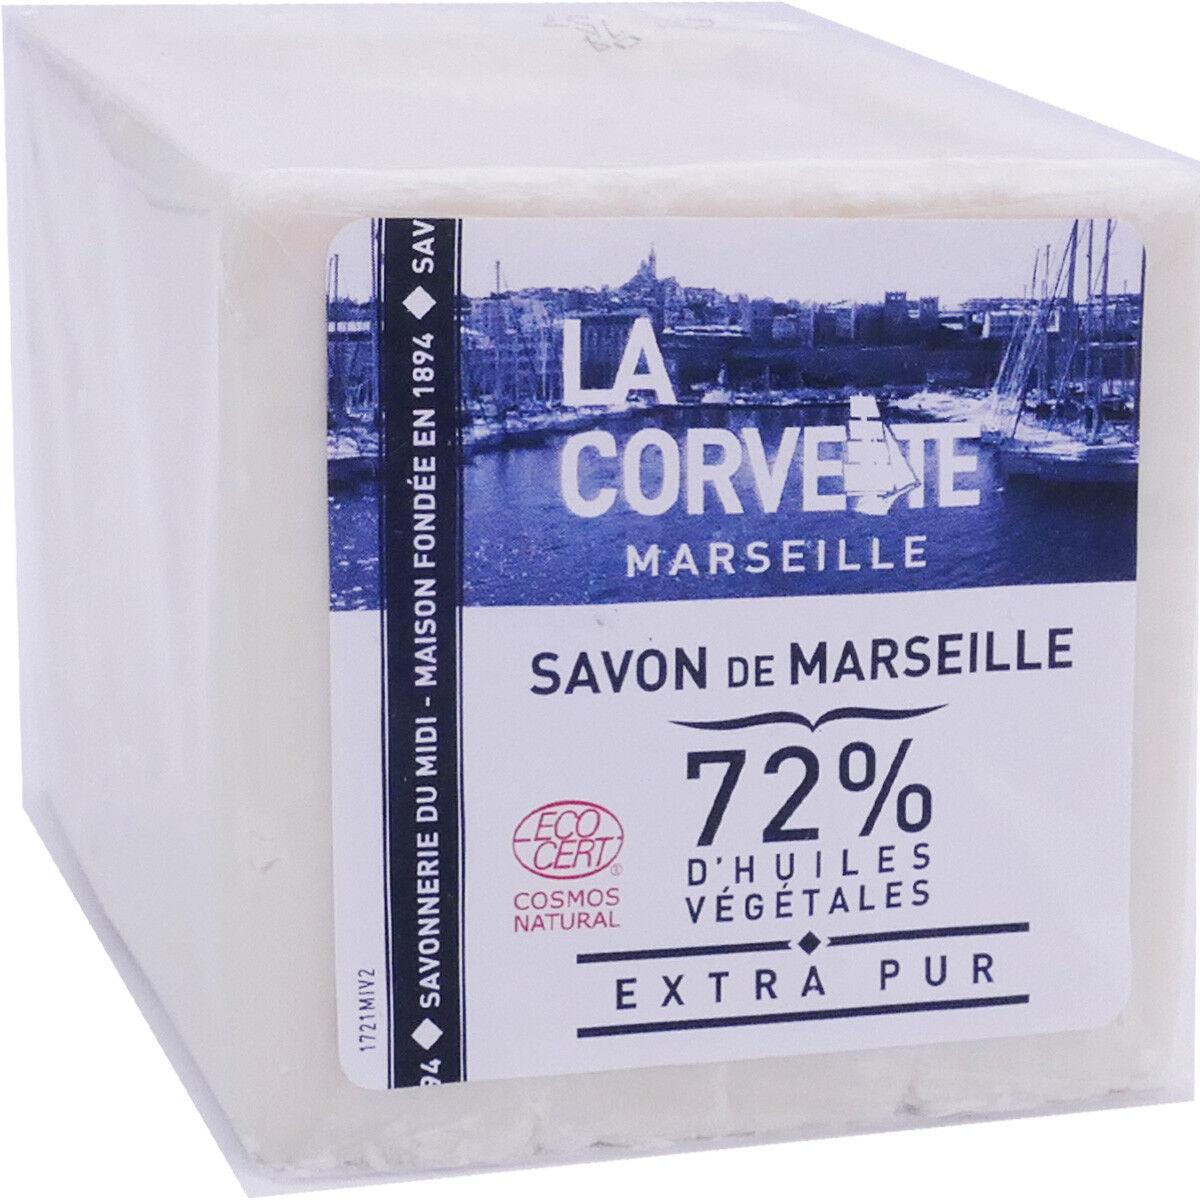 La corvette savon de marseille 300g huiles vegetales